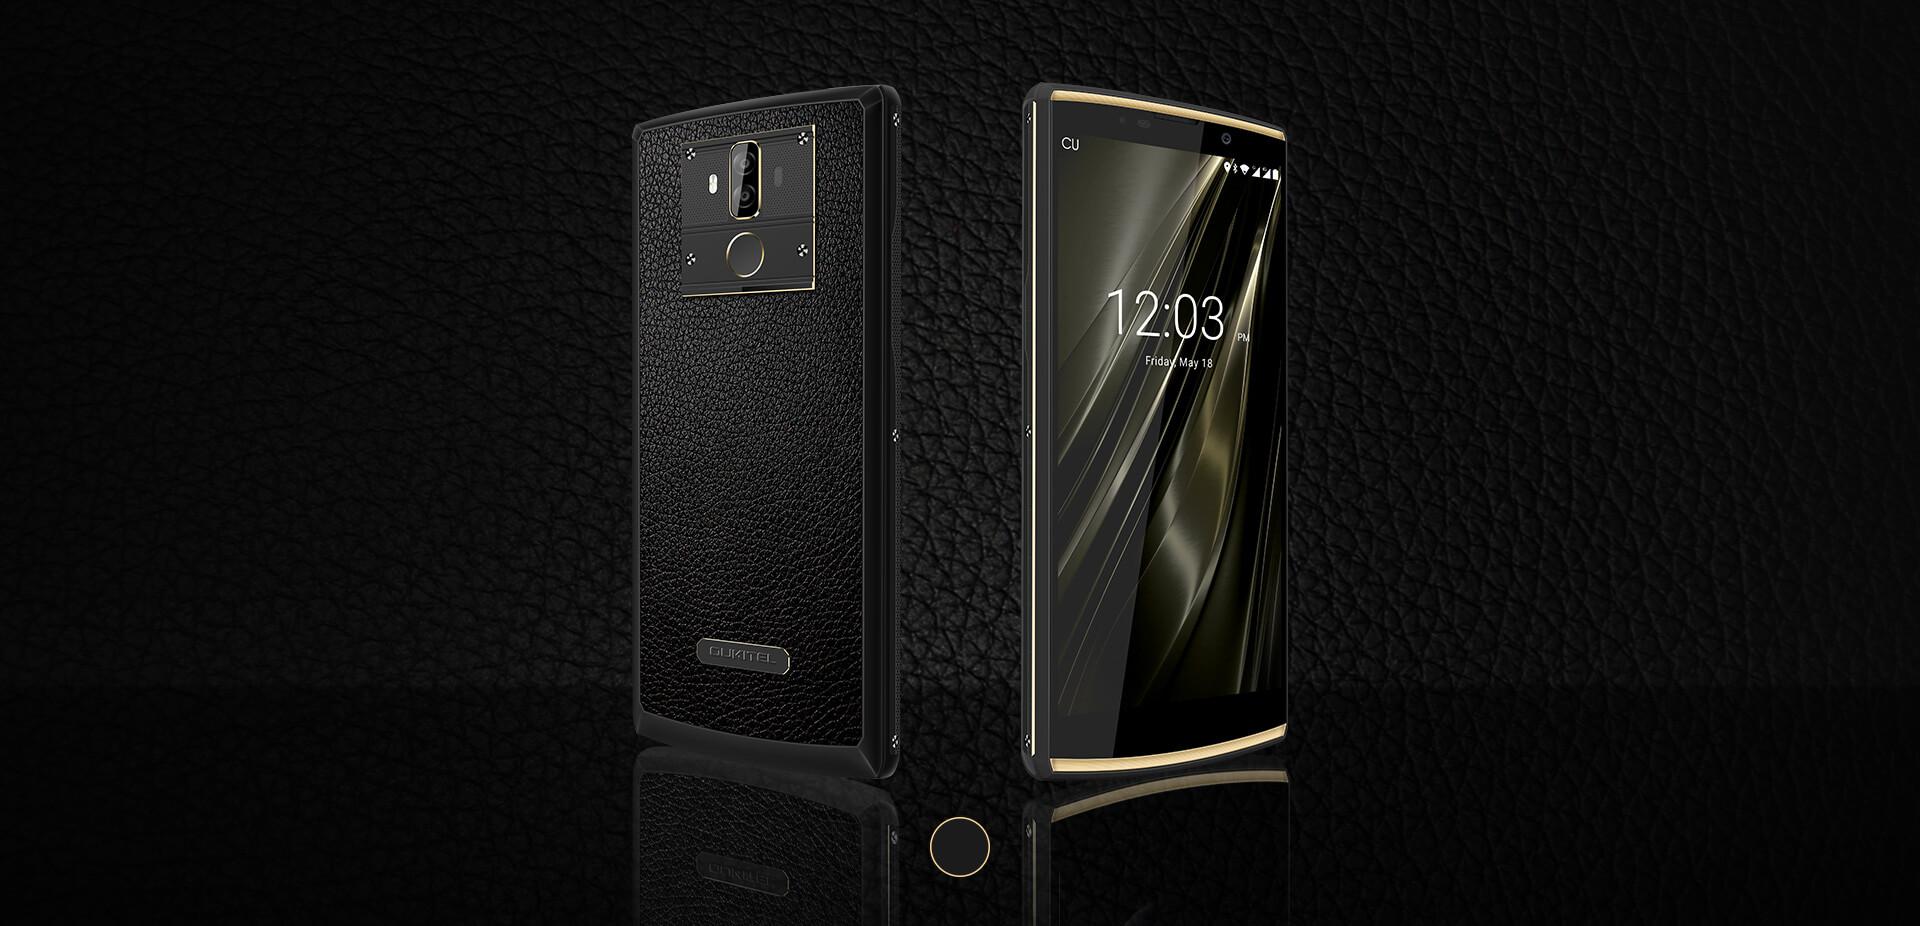 Jarang Beredar di Pasaran, Smartphone Canggih ini Dijual Murah